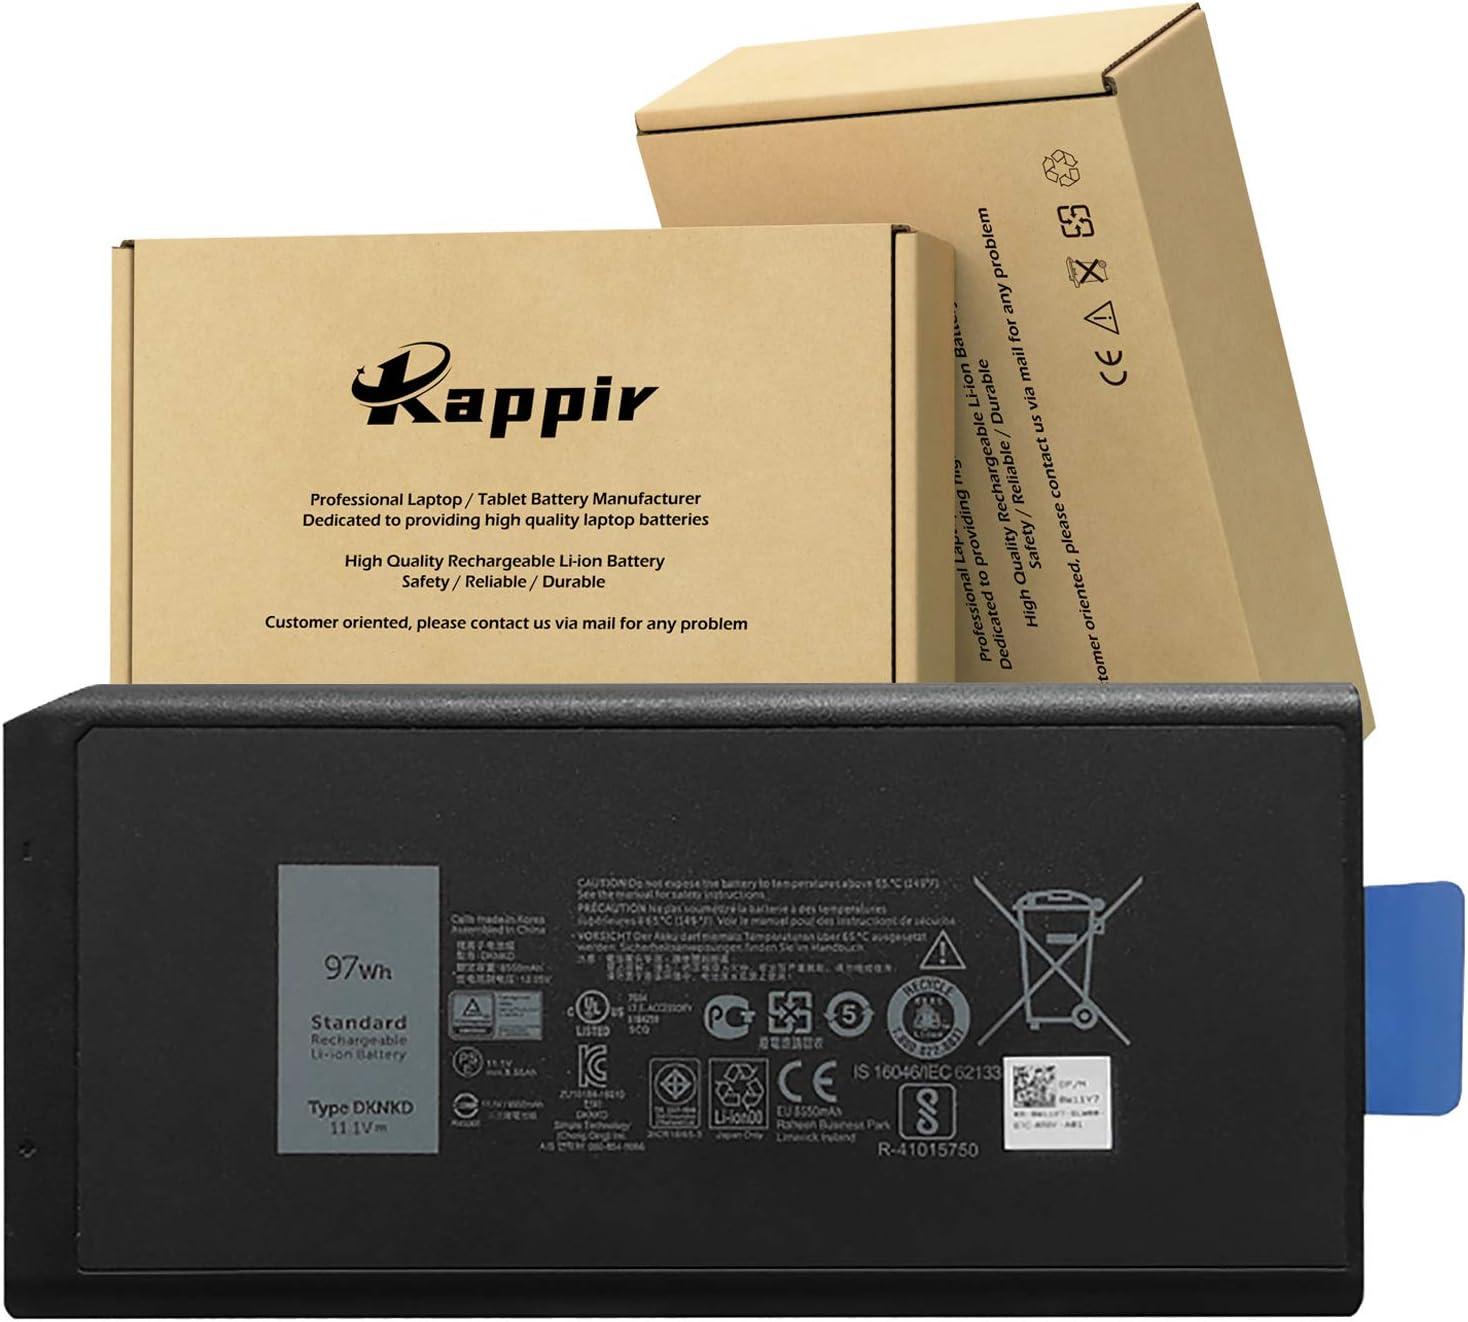 BOWEIRUI DKNKD (11.1V 97Wh) Laptop Battery Replacement for Dell Latitude 14 5404 7204 7404 E5404 E7204 E7404 Series Notebook X8VWF 4XKN5 CJ2K1 5XT3V VCWGN XN4KN XRJDF YGV51 0W11V7 453-BBBE